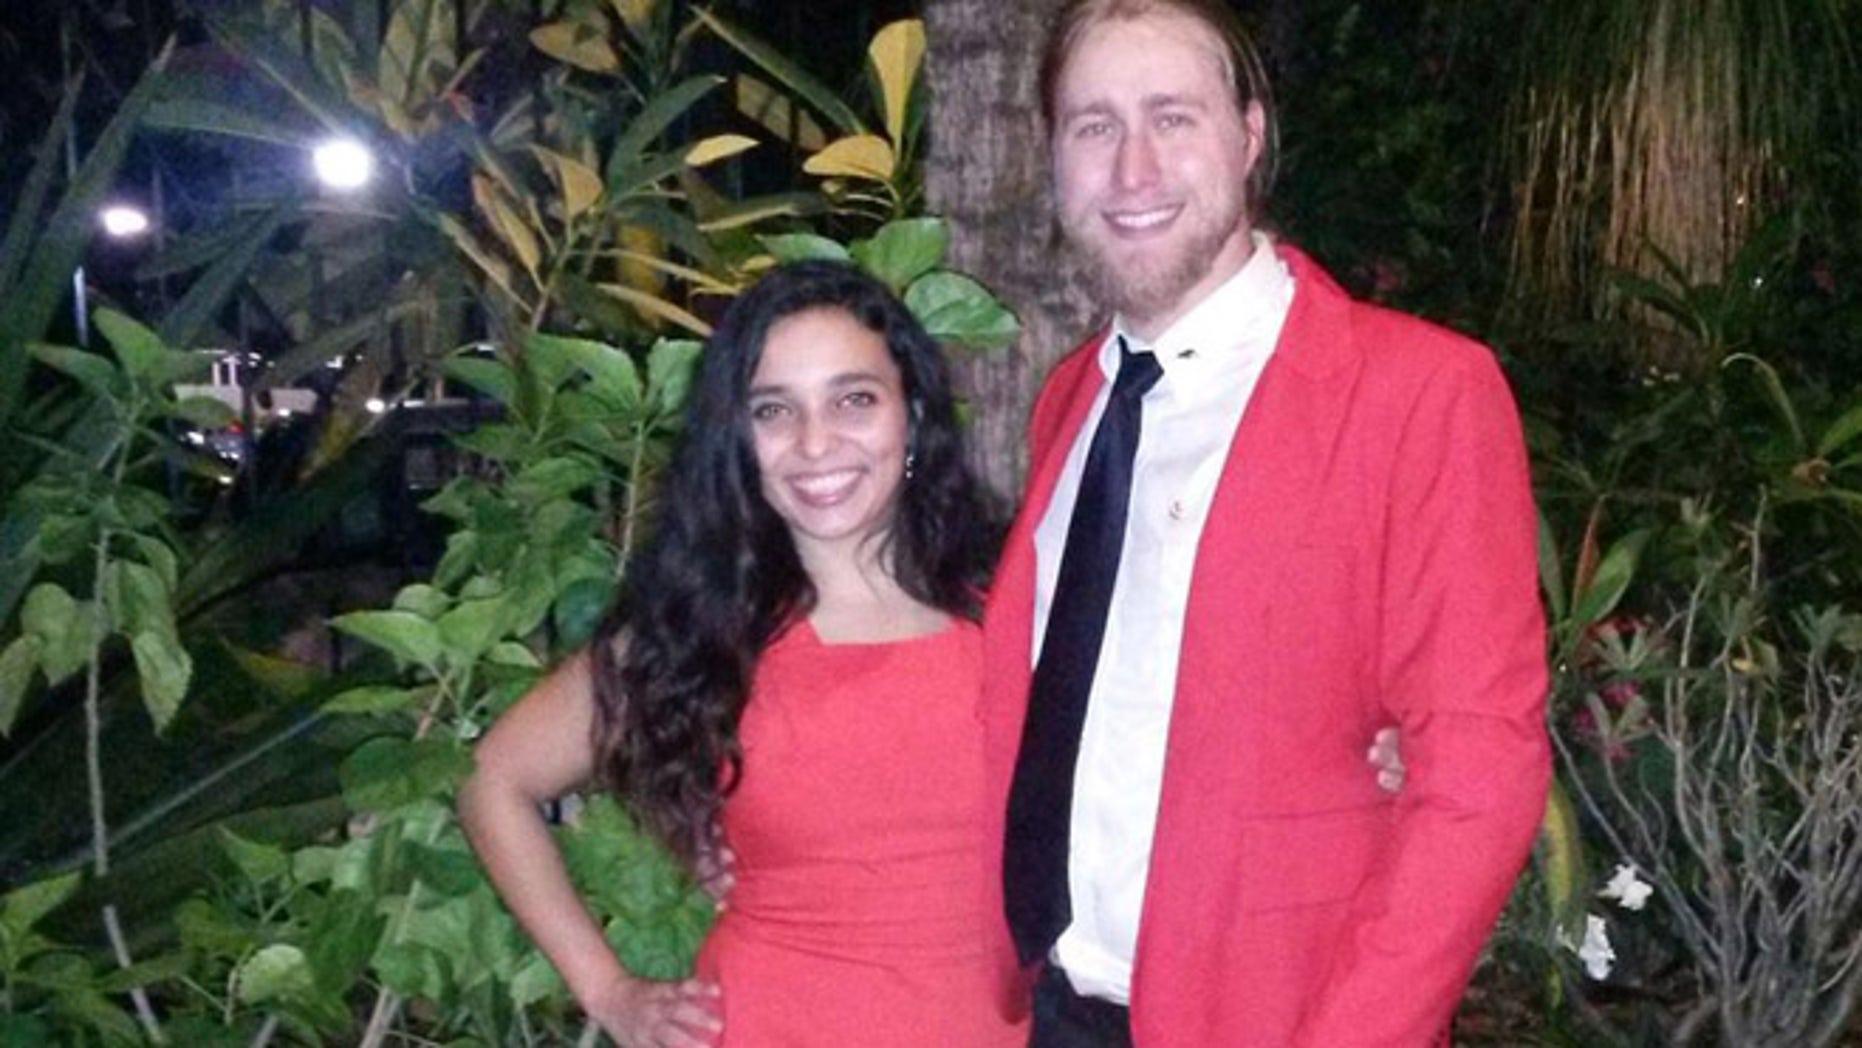 Barbara Jimenez and her boyfriend, John Fox, who were both injured in a car crash outside Havana, Cuba, in early August. (Source: GoFundMe page)